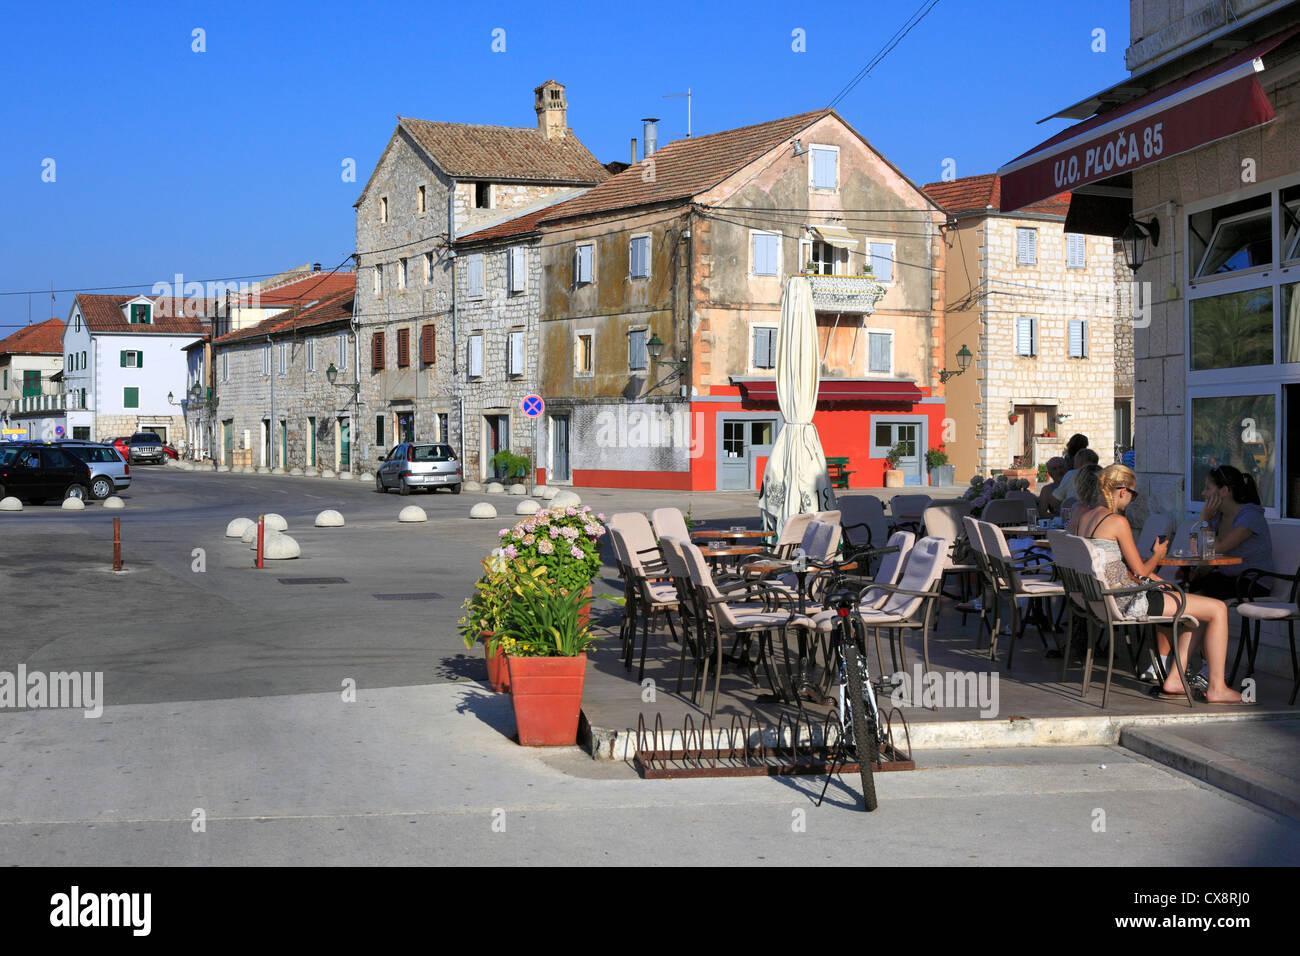 Street cafe, Stari Grad, Island of Hvar, Dalmatian coast, Croatia - Stock Image